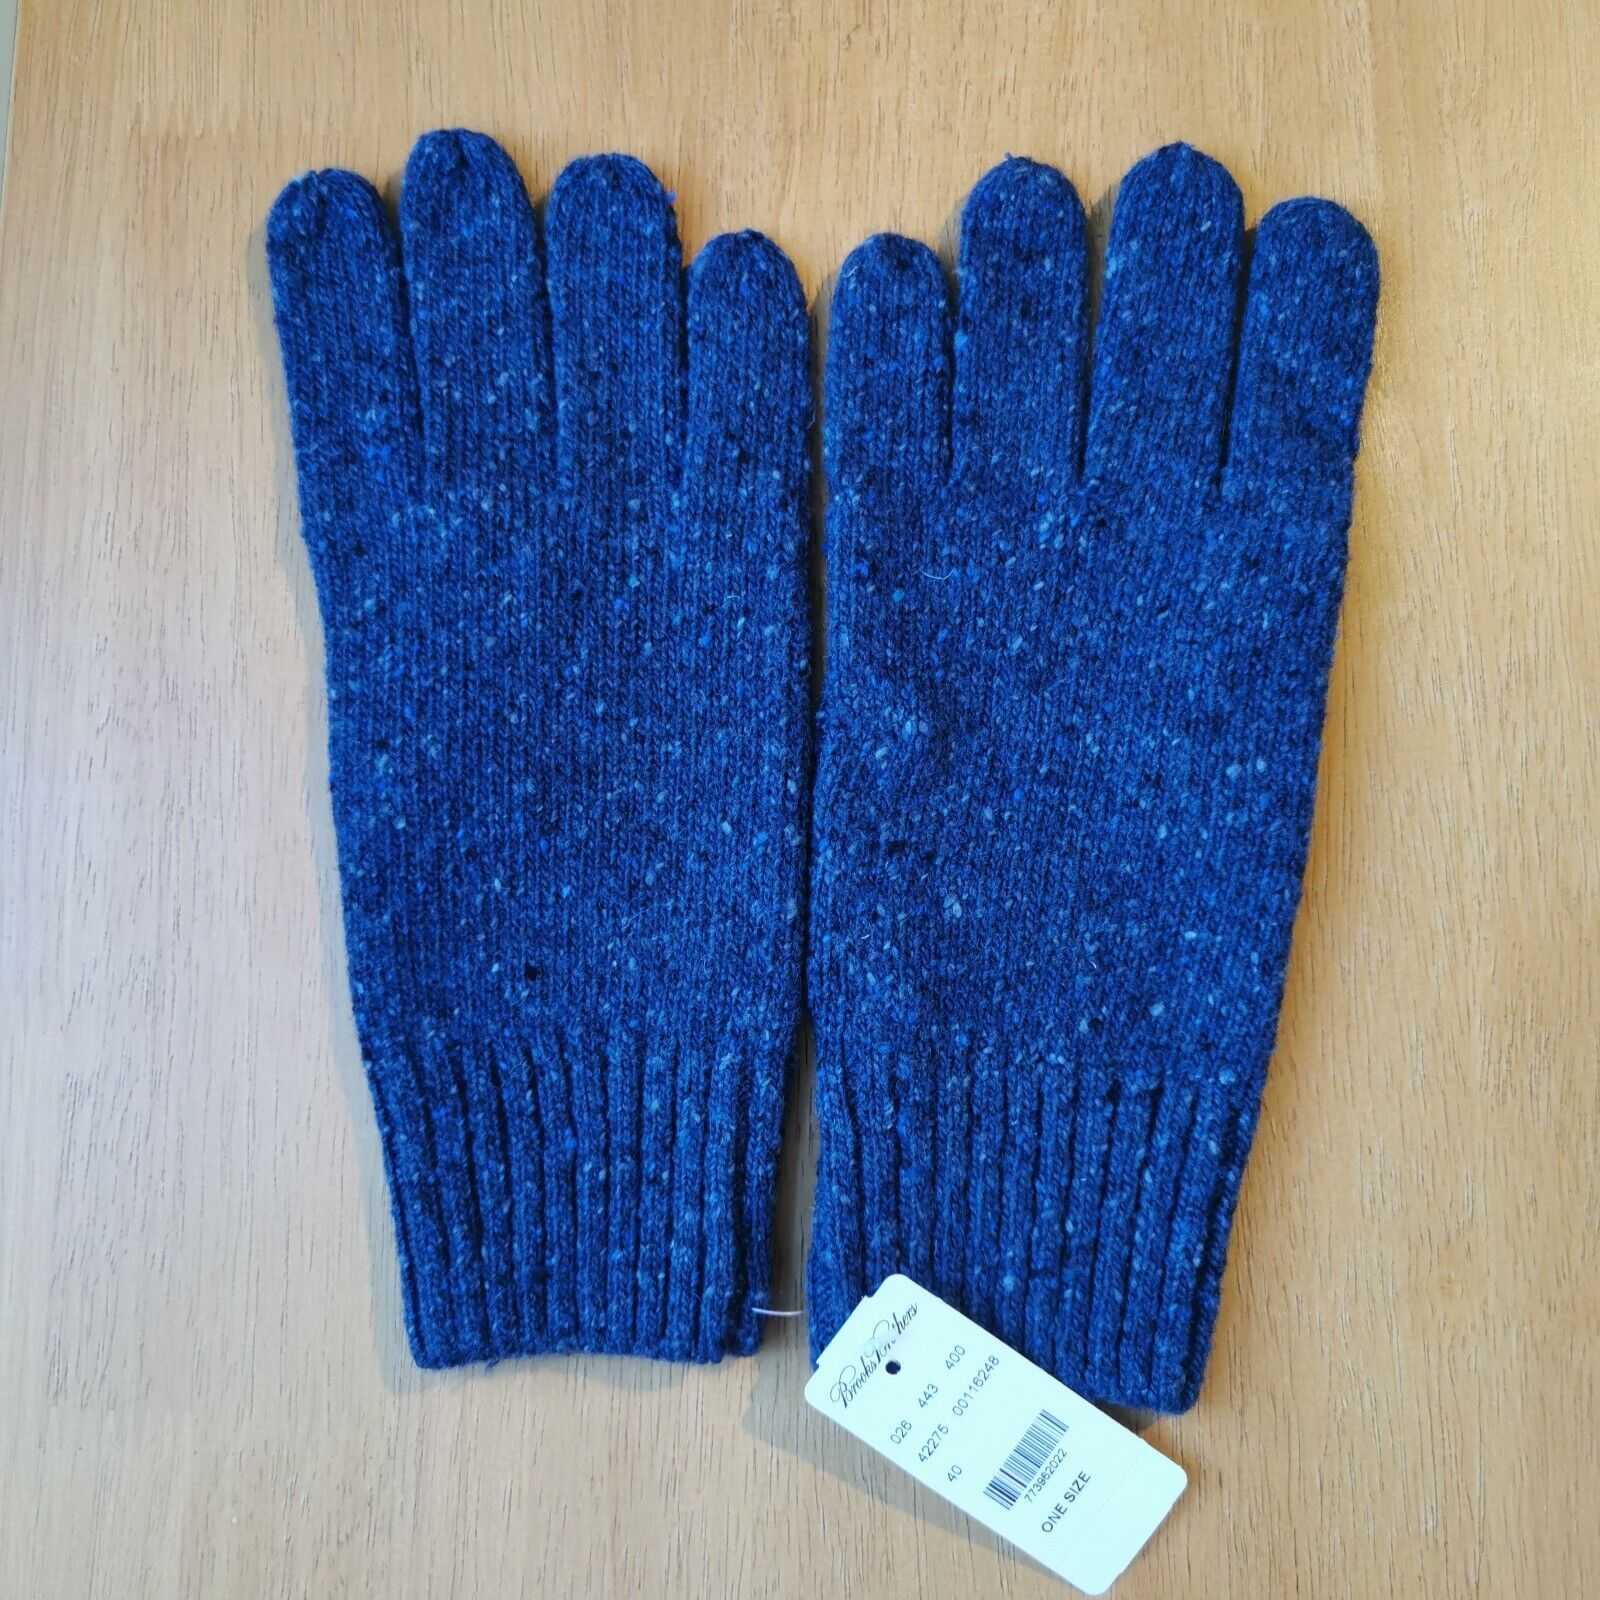 Brooks Brothers Men's One Size Italian Yarn Knitted Merino Wool Blue Knit Gloves